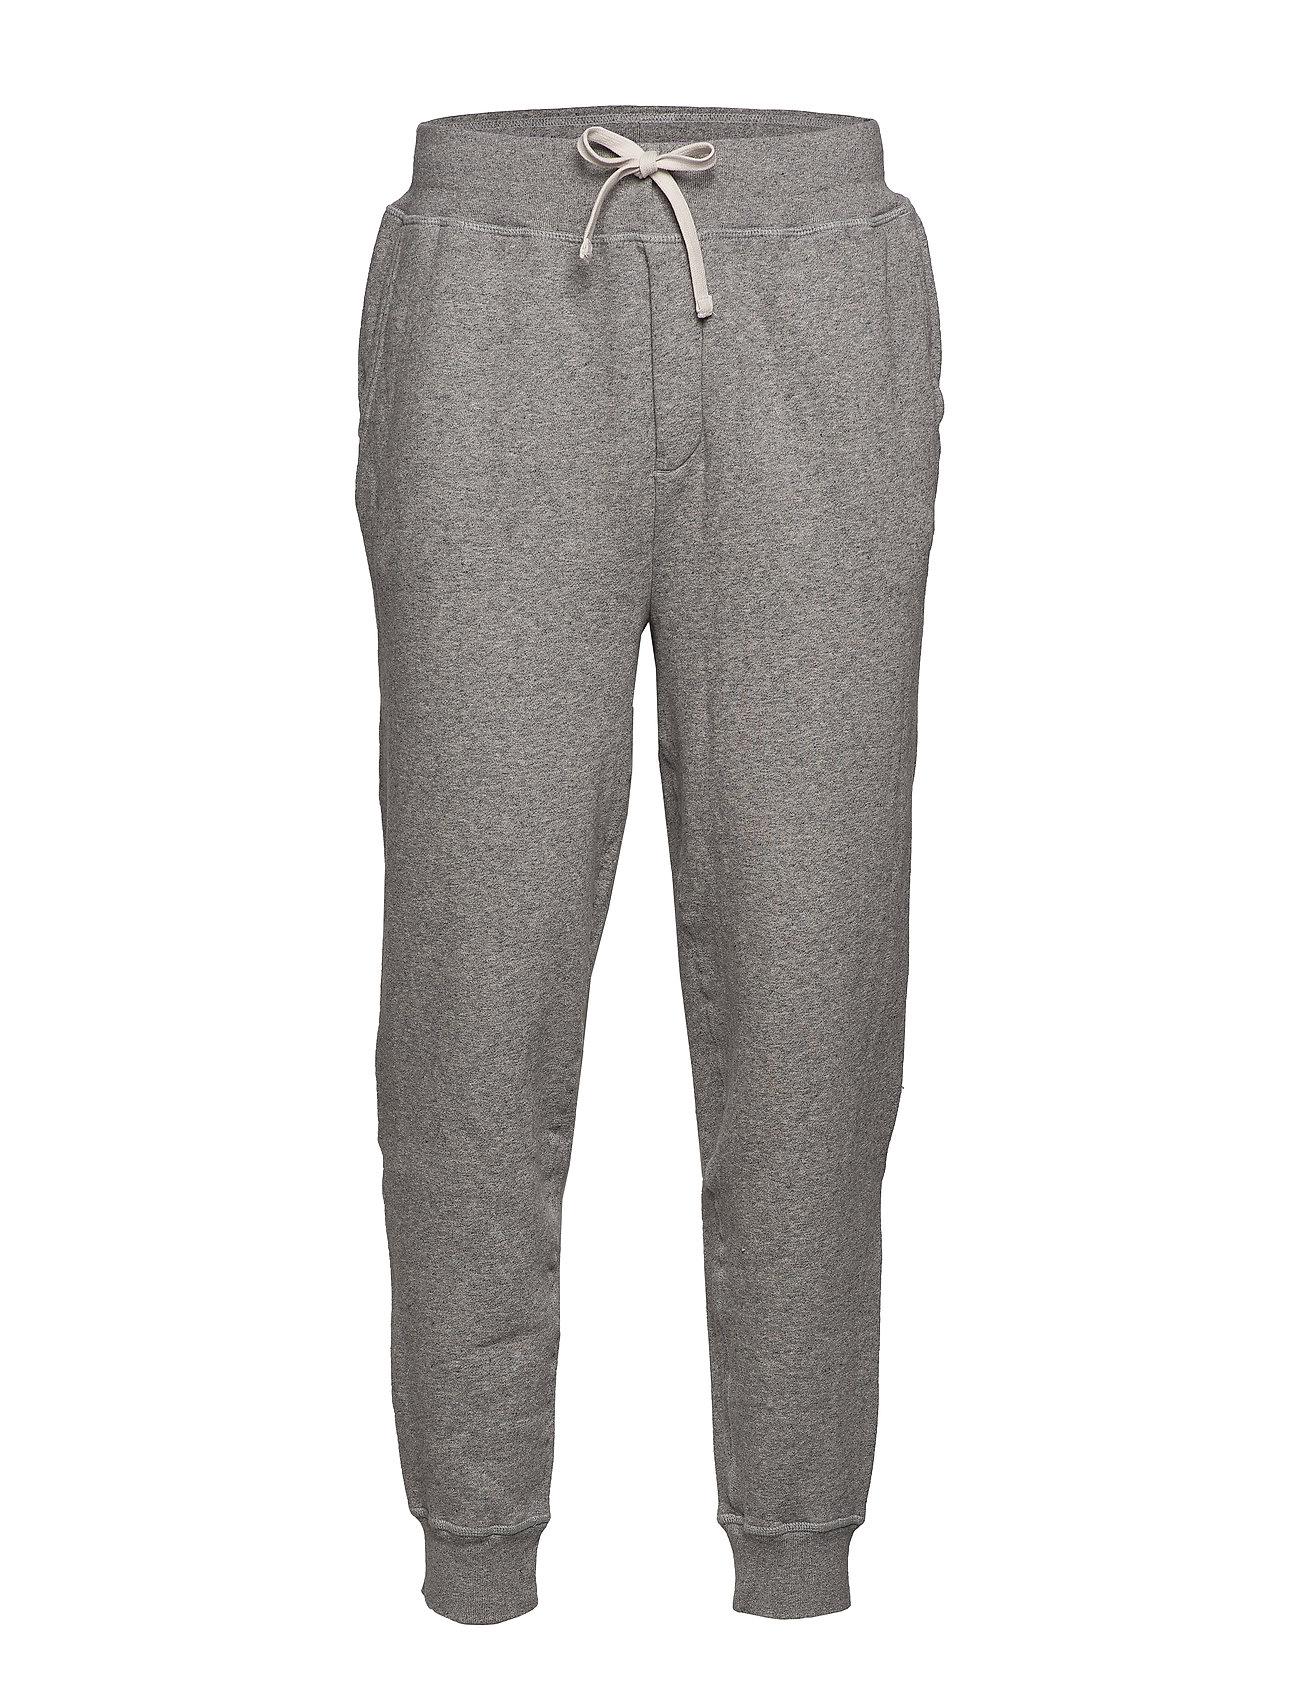 Polo Ralph Lauren Garment-Dyed Fleece Pant - DARK VINTAGE HEAT